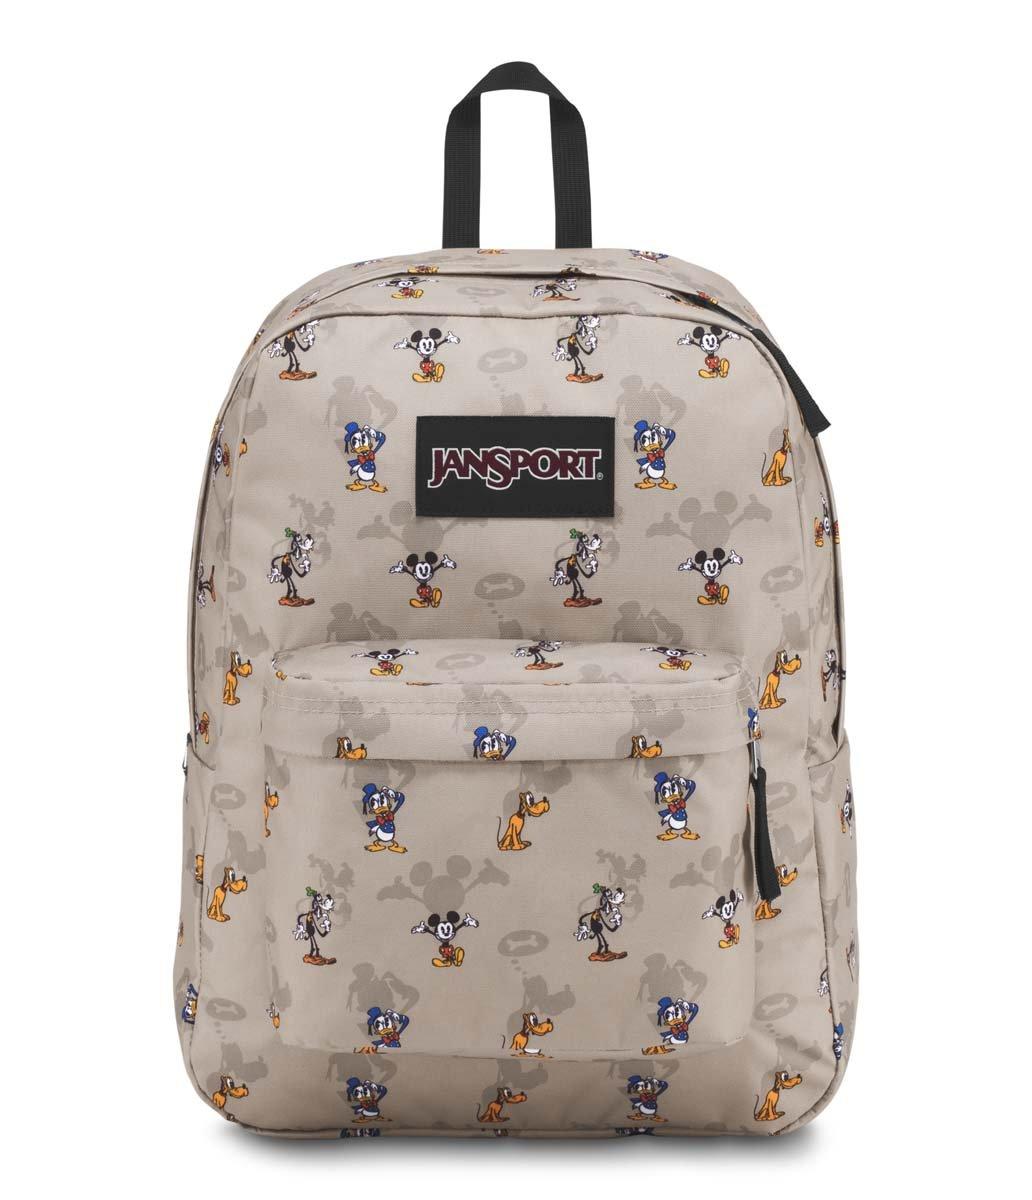 JanSport Disney Superbreak Backpack (Fab Shadow)